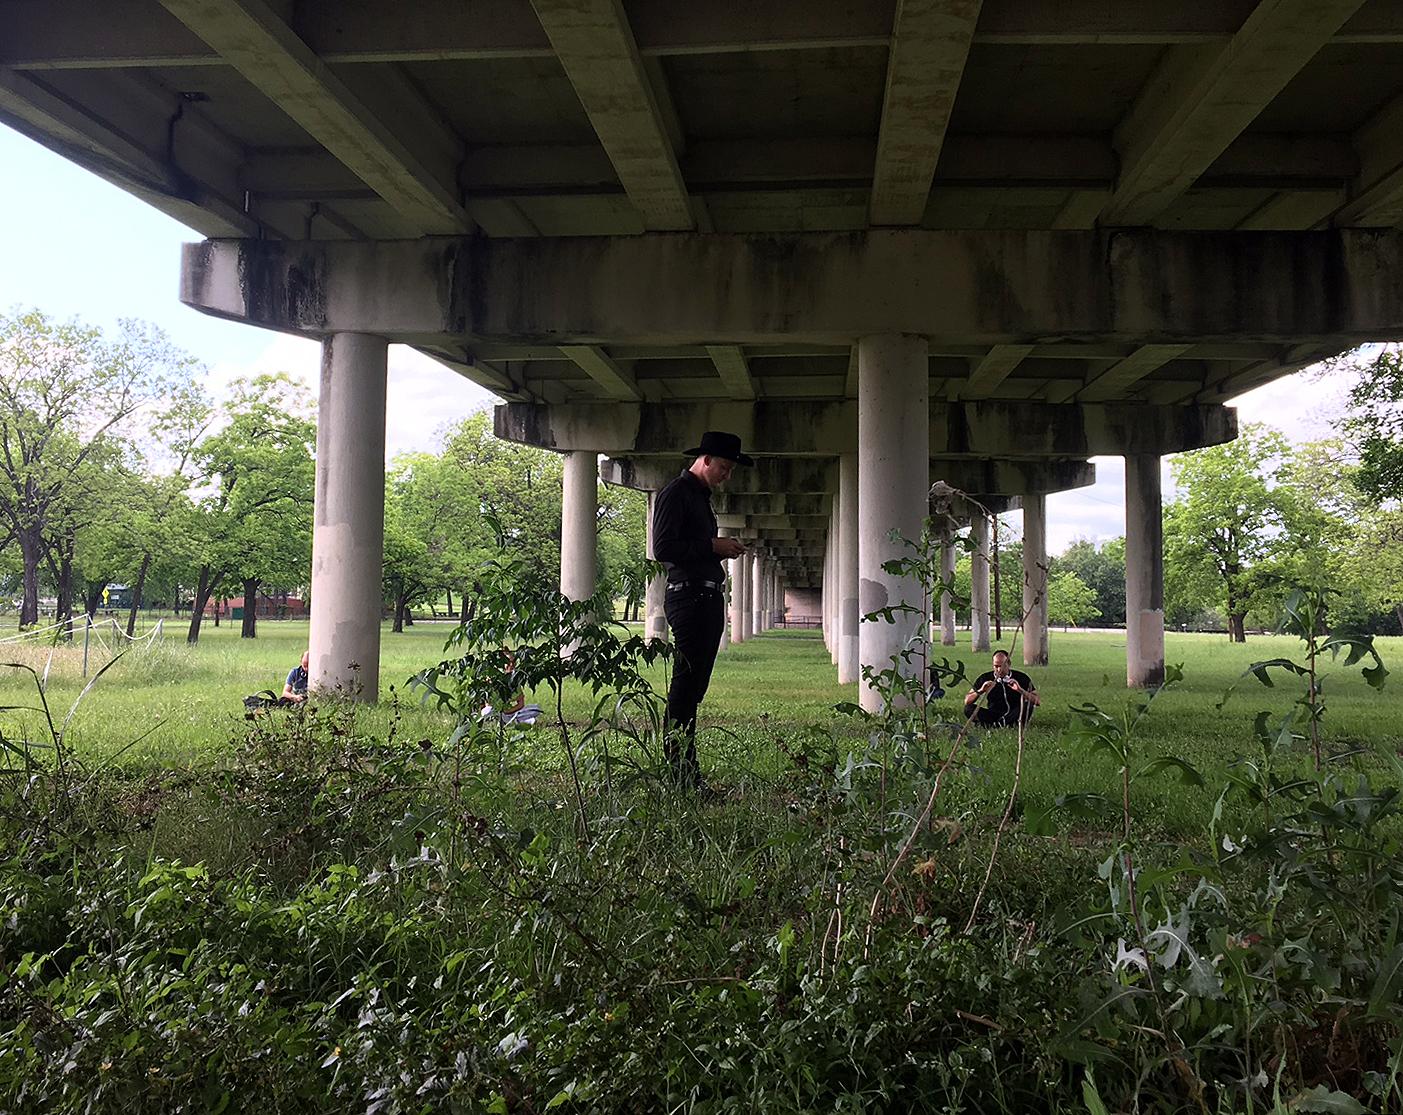 Basking in reverberations under the bridge.